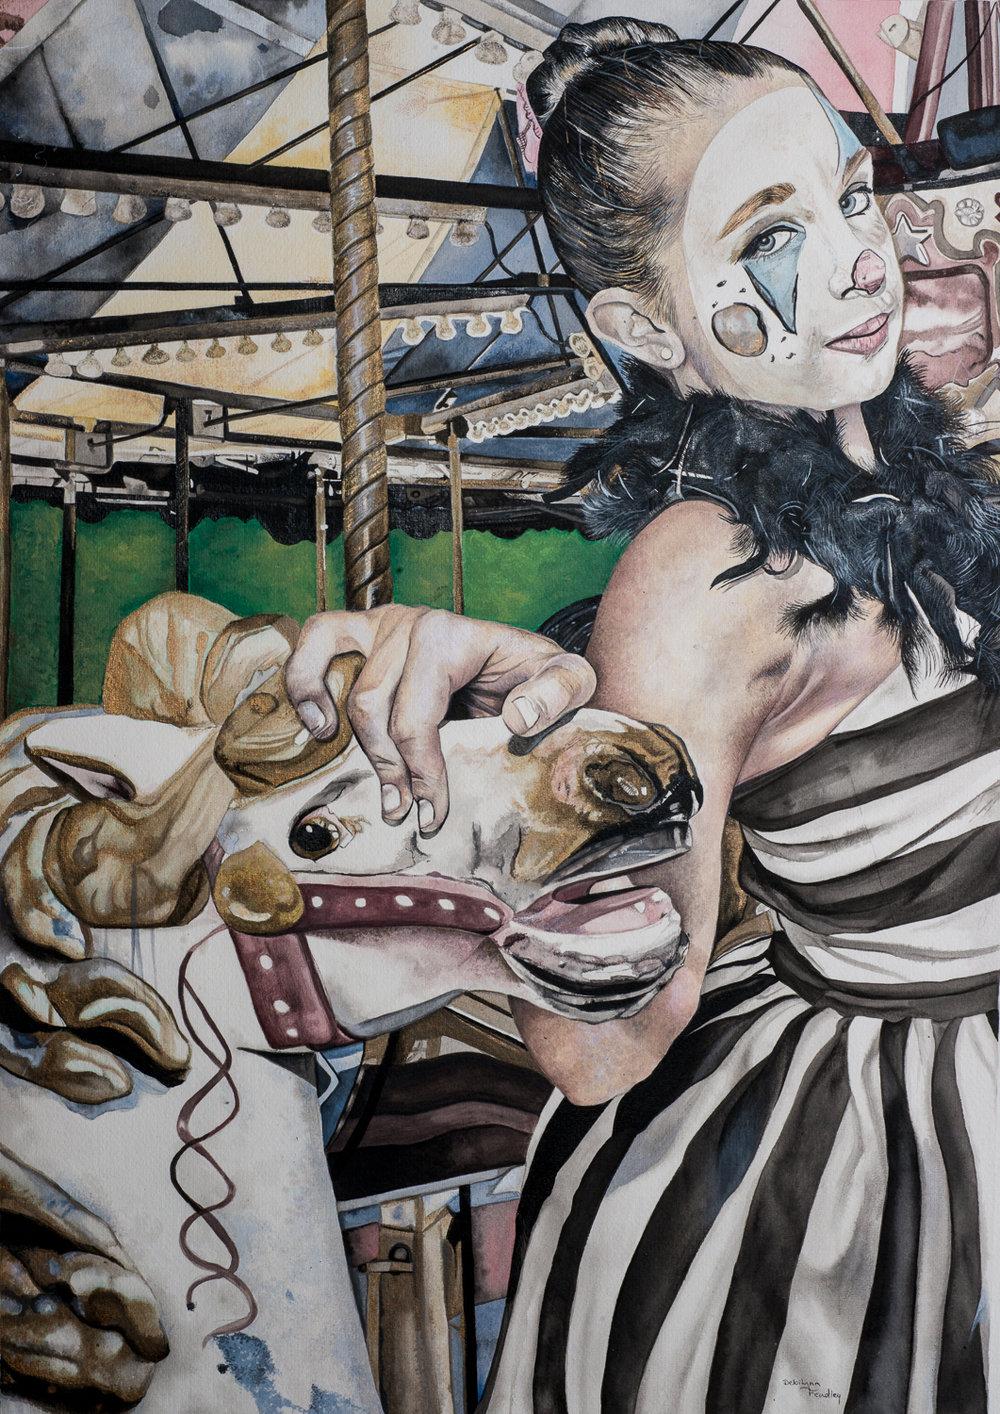 DebiLynn Fendley Title: Carousel Size: 30 x 22 x 1 Price: $1500